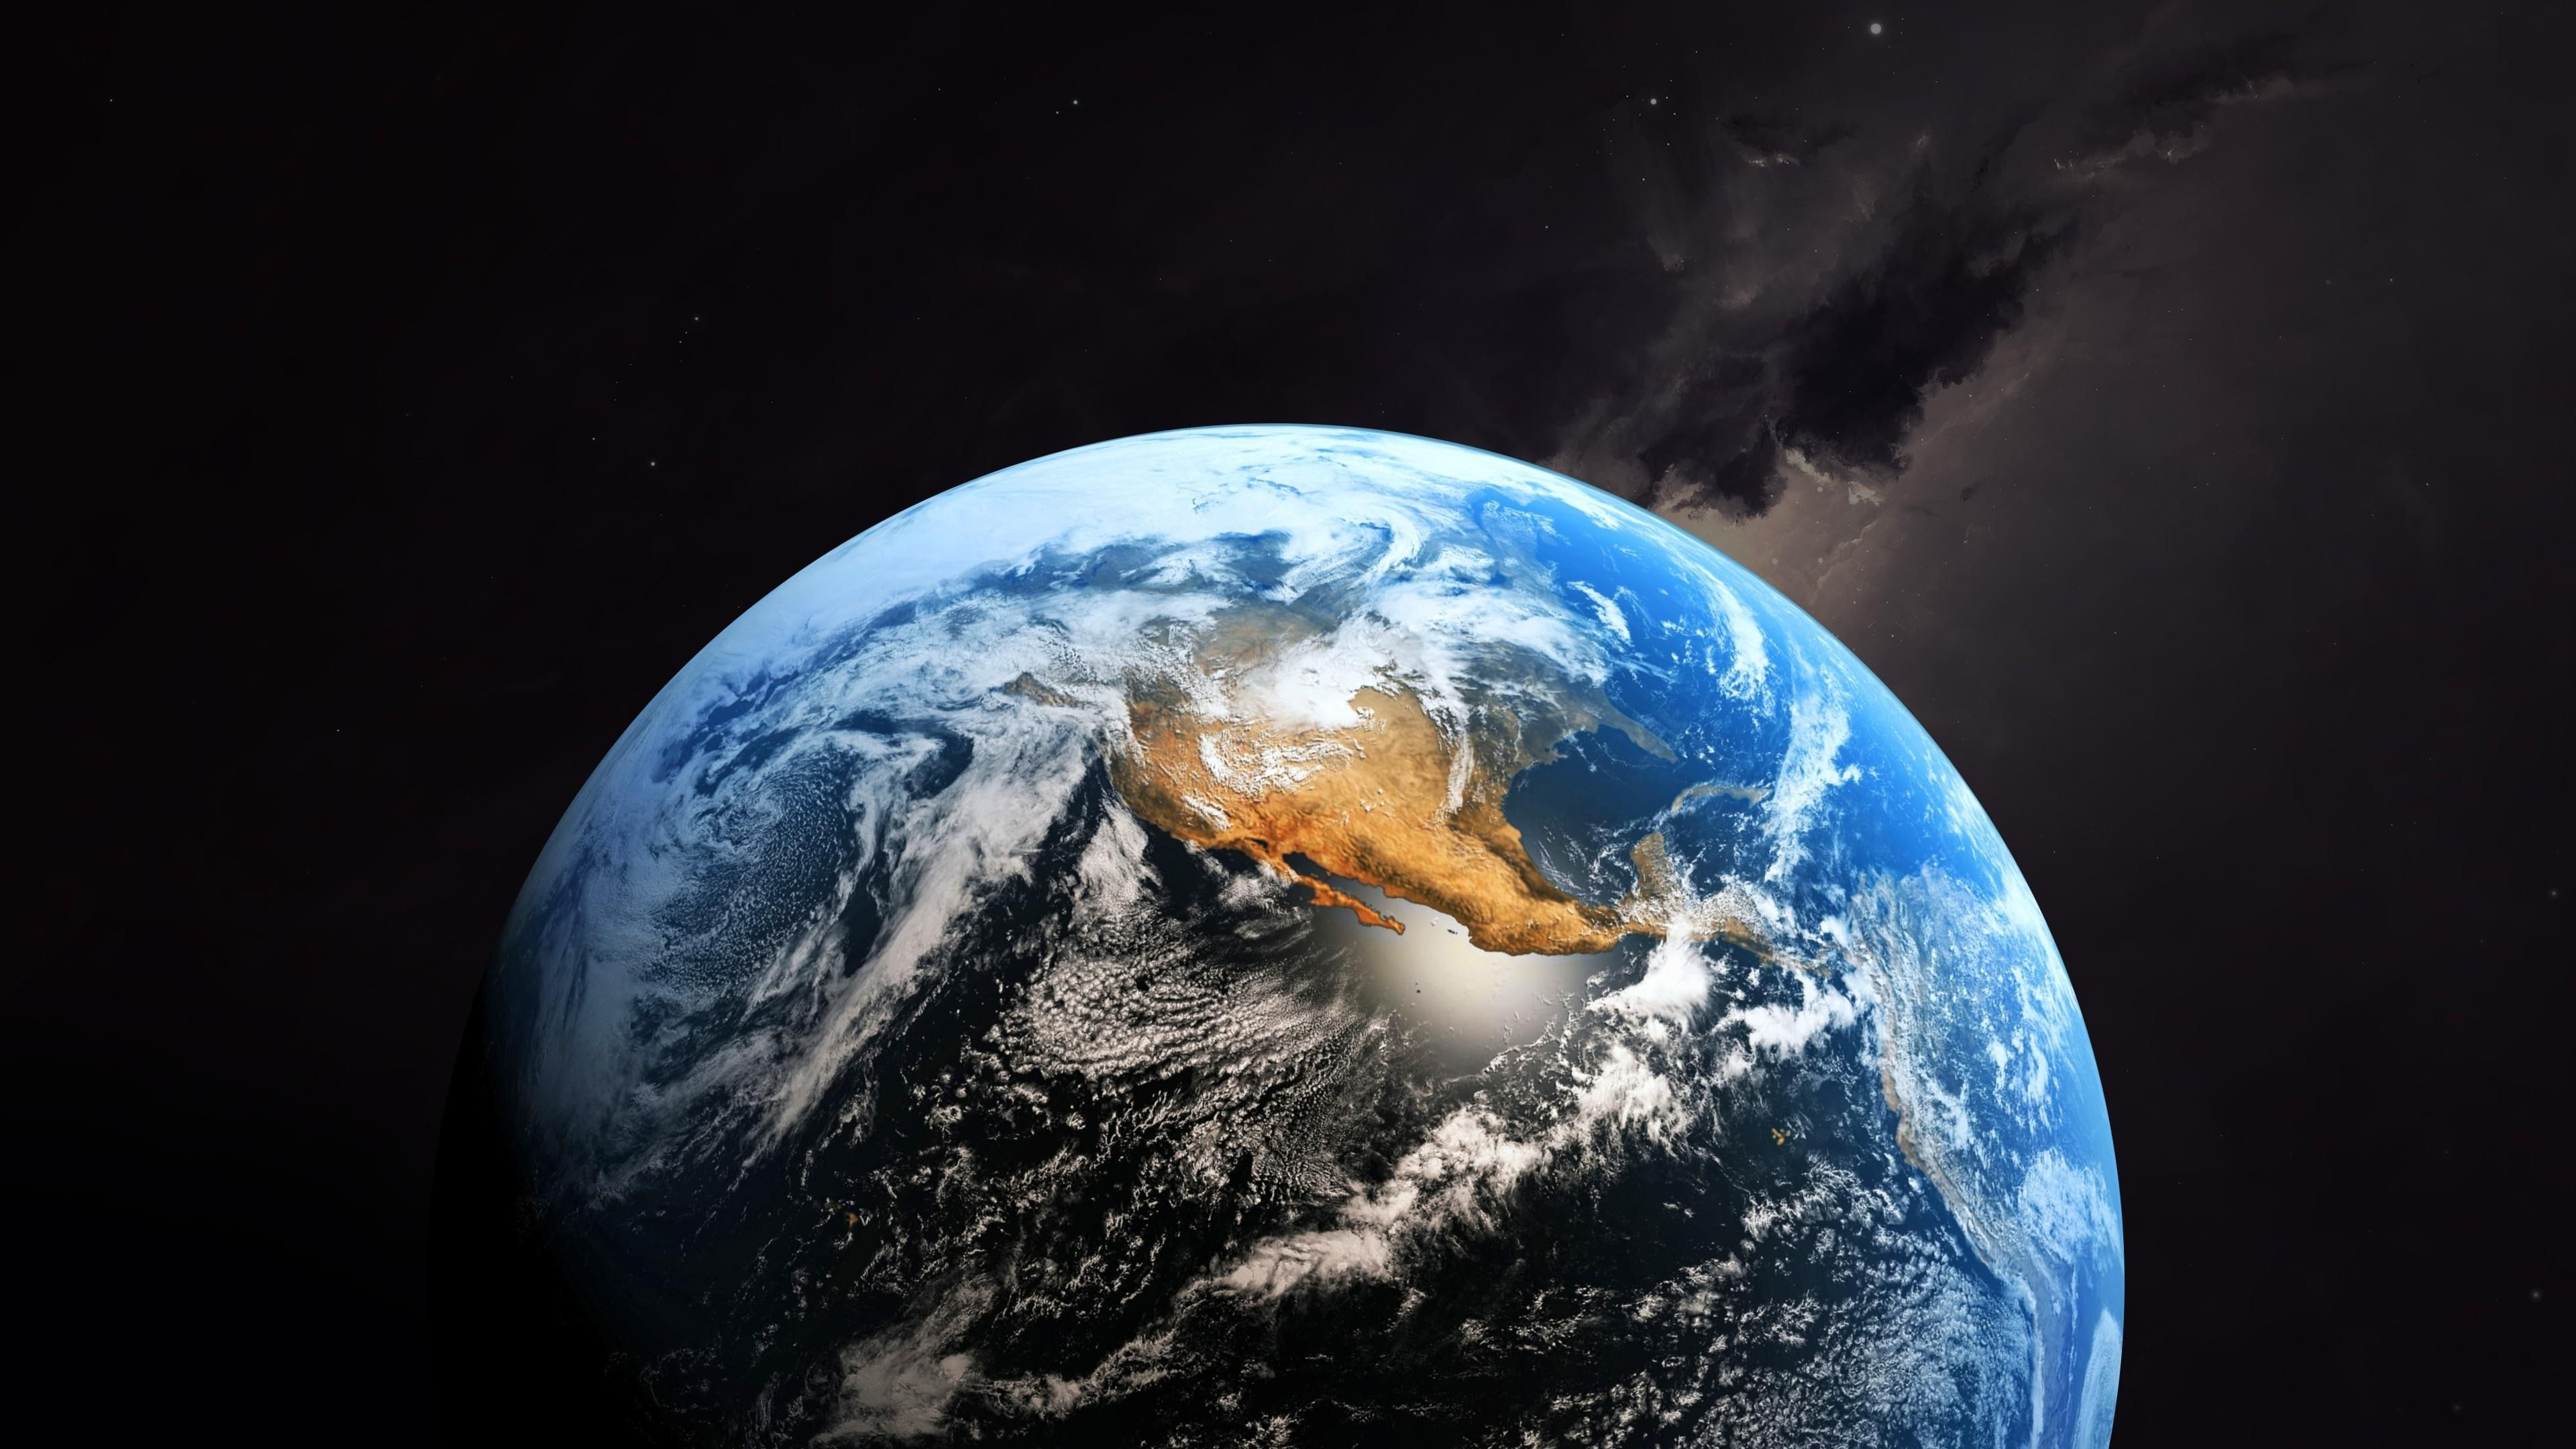 Earth Planet Space Galaxy 4k Wallpaper Hdwallpaper Desktop Wallpaper Earth Earth Hd Samsung Wallpaper